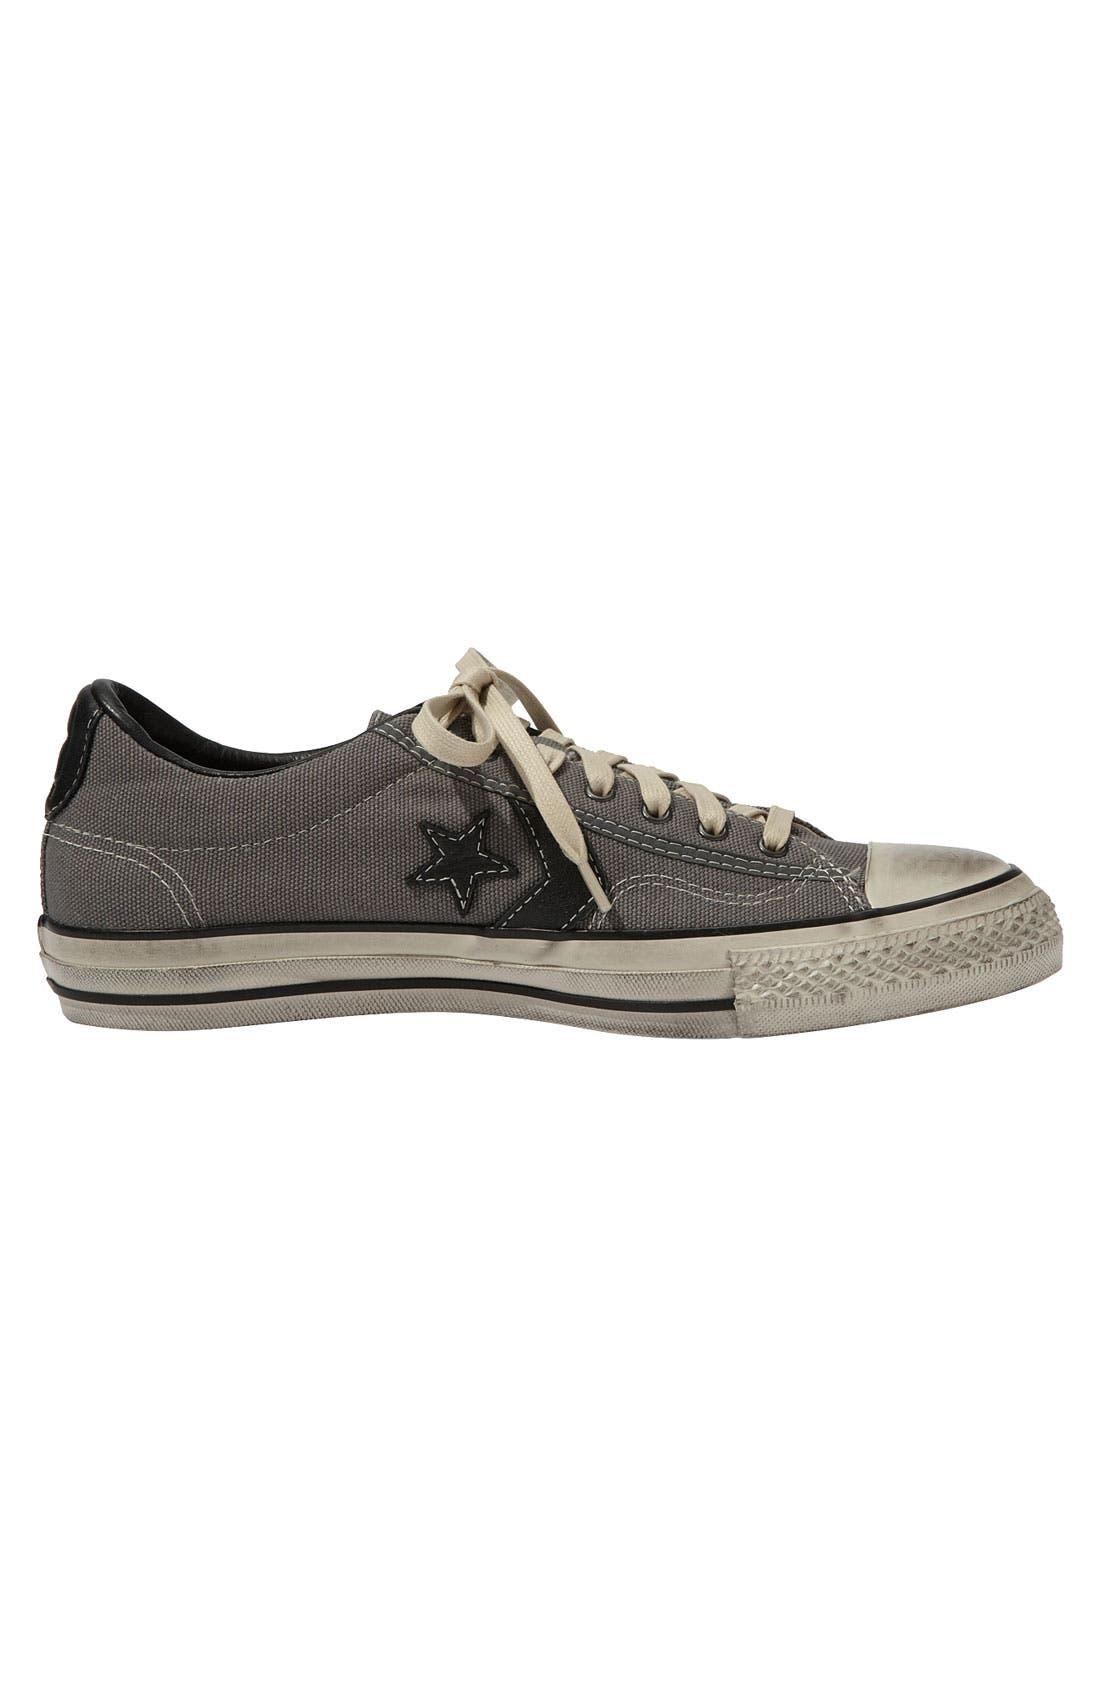 Alternate Image 2  - Converse by John Varvatos 'Star Player' Canvas Sneaker (Men)